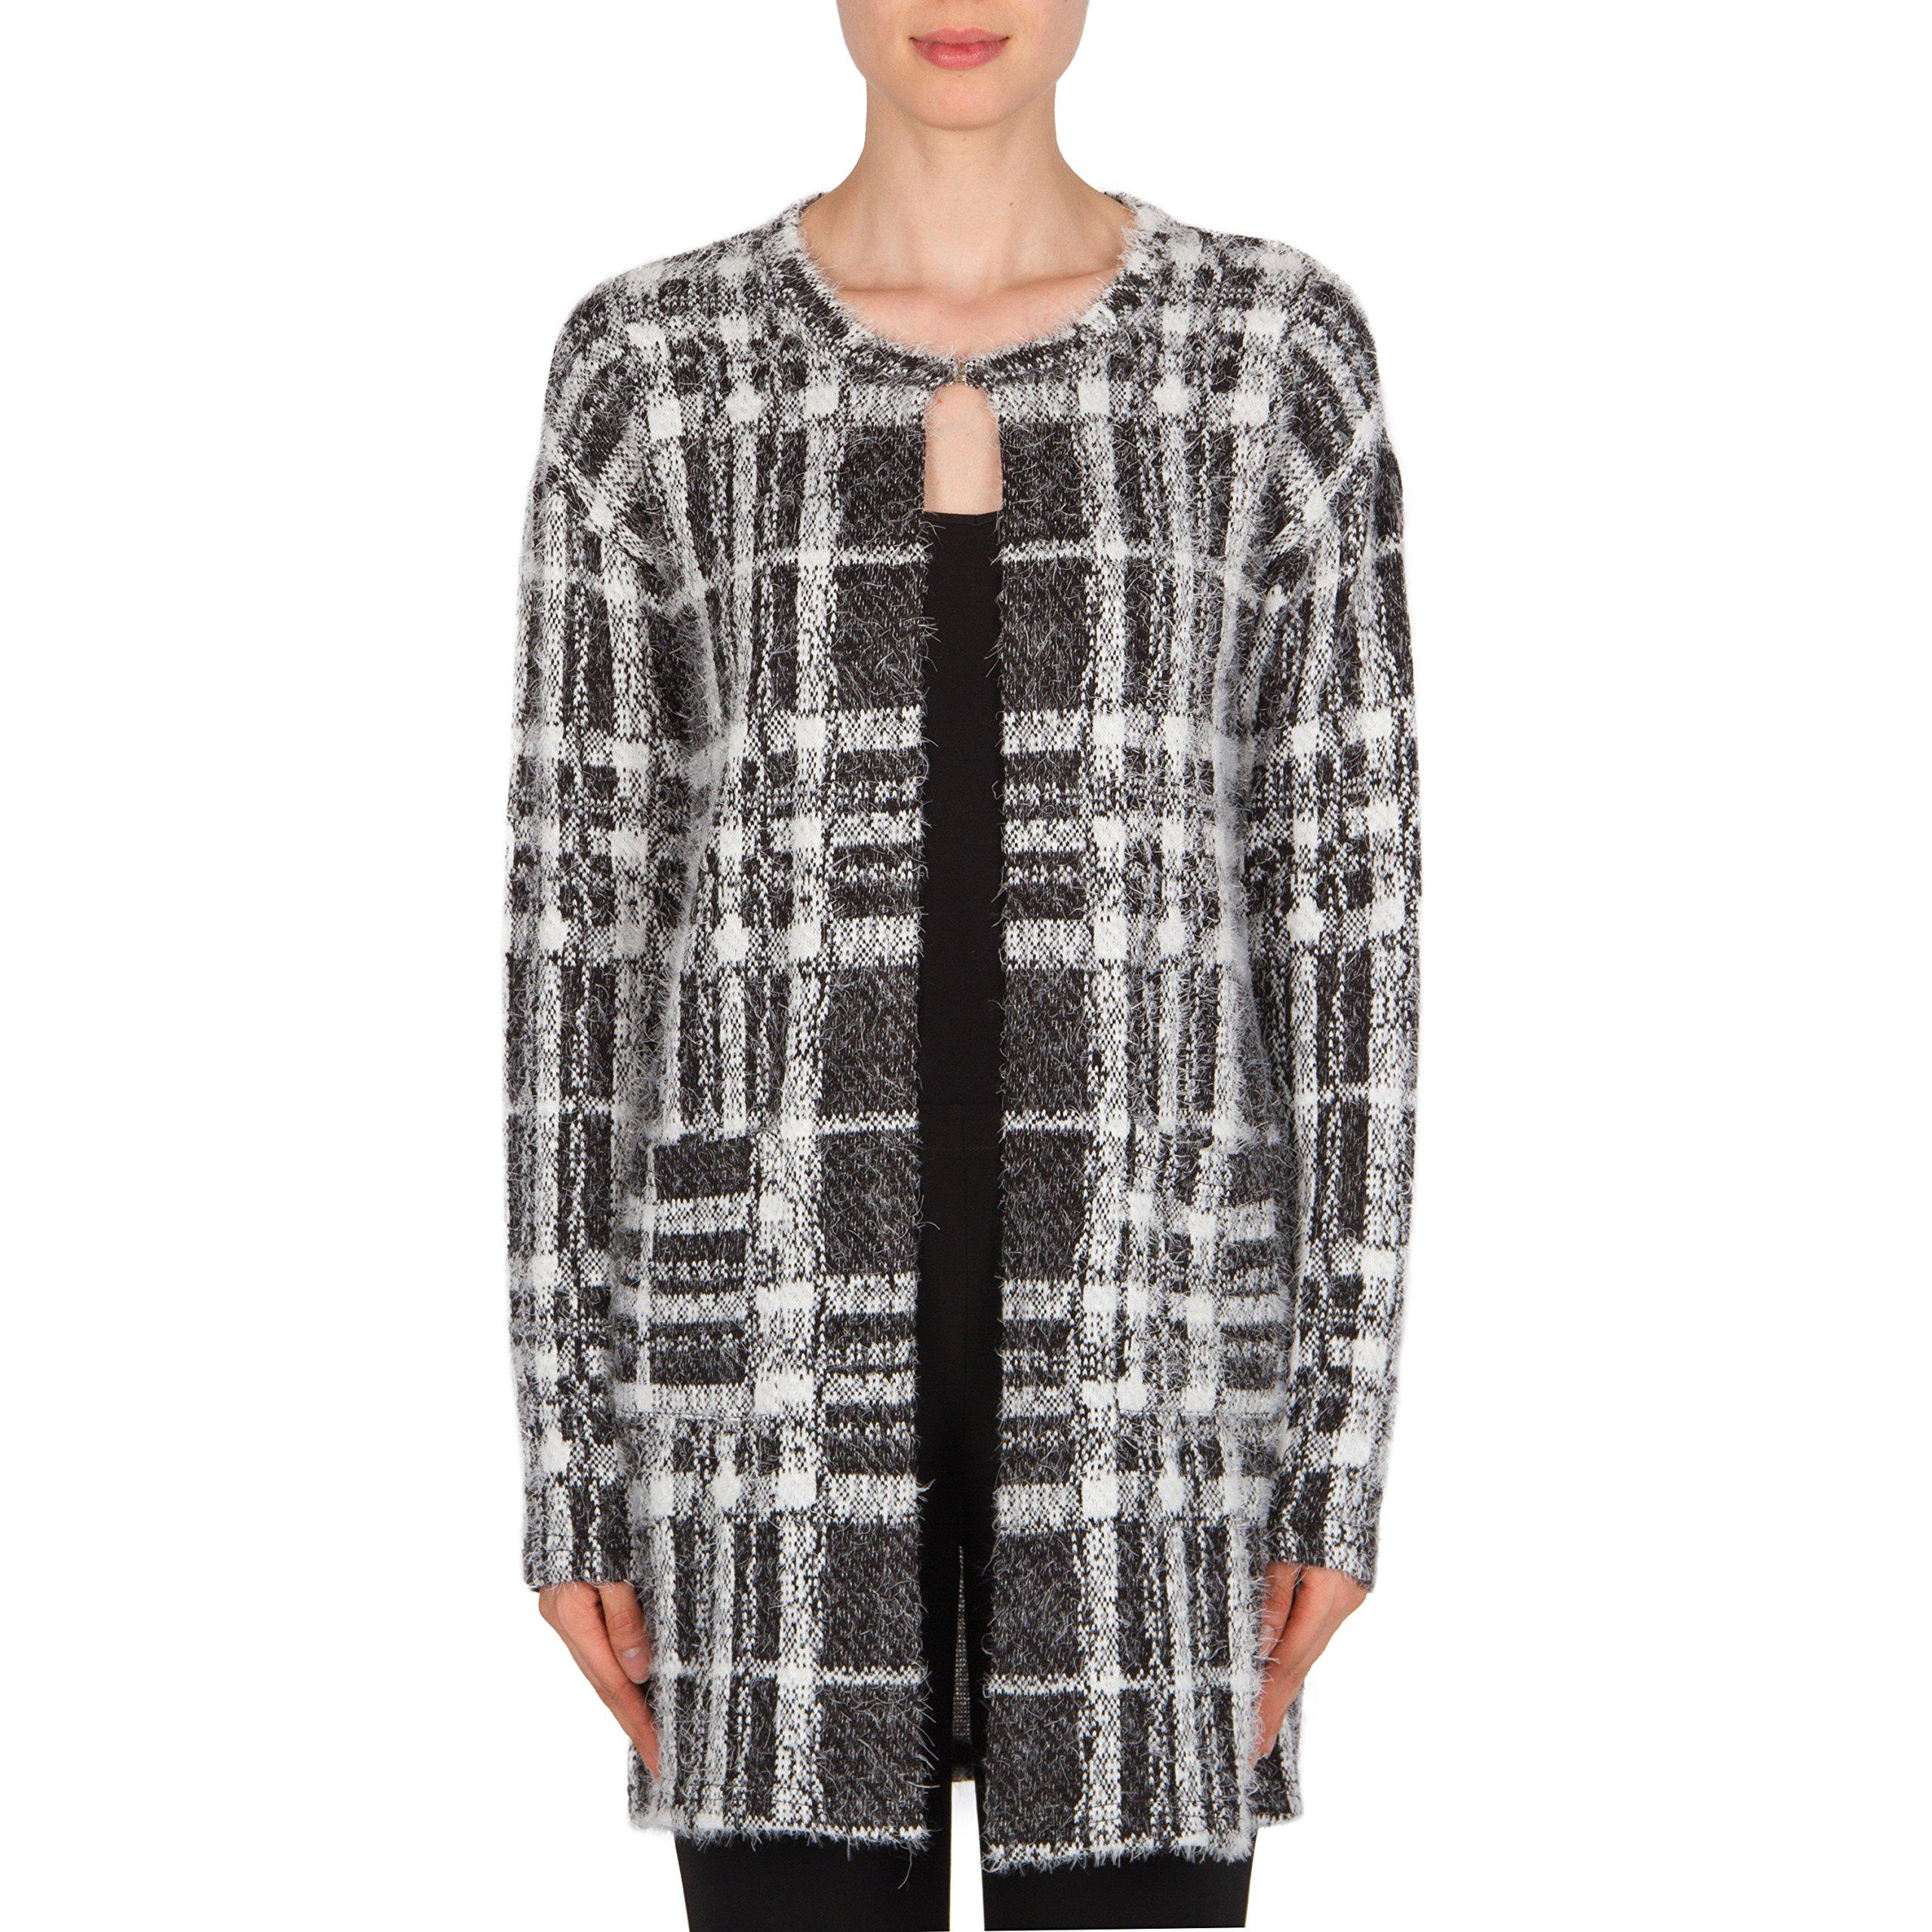 Joseph Ribkoff Mohair-Like Knit Tunic Length Jacket Style 174836 Size 14